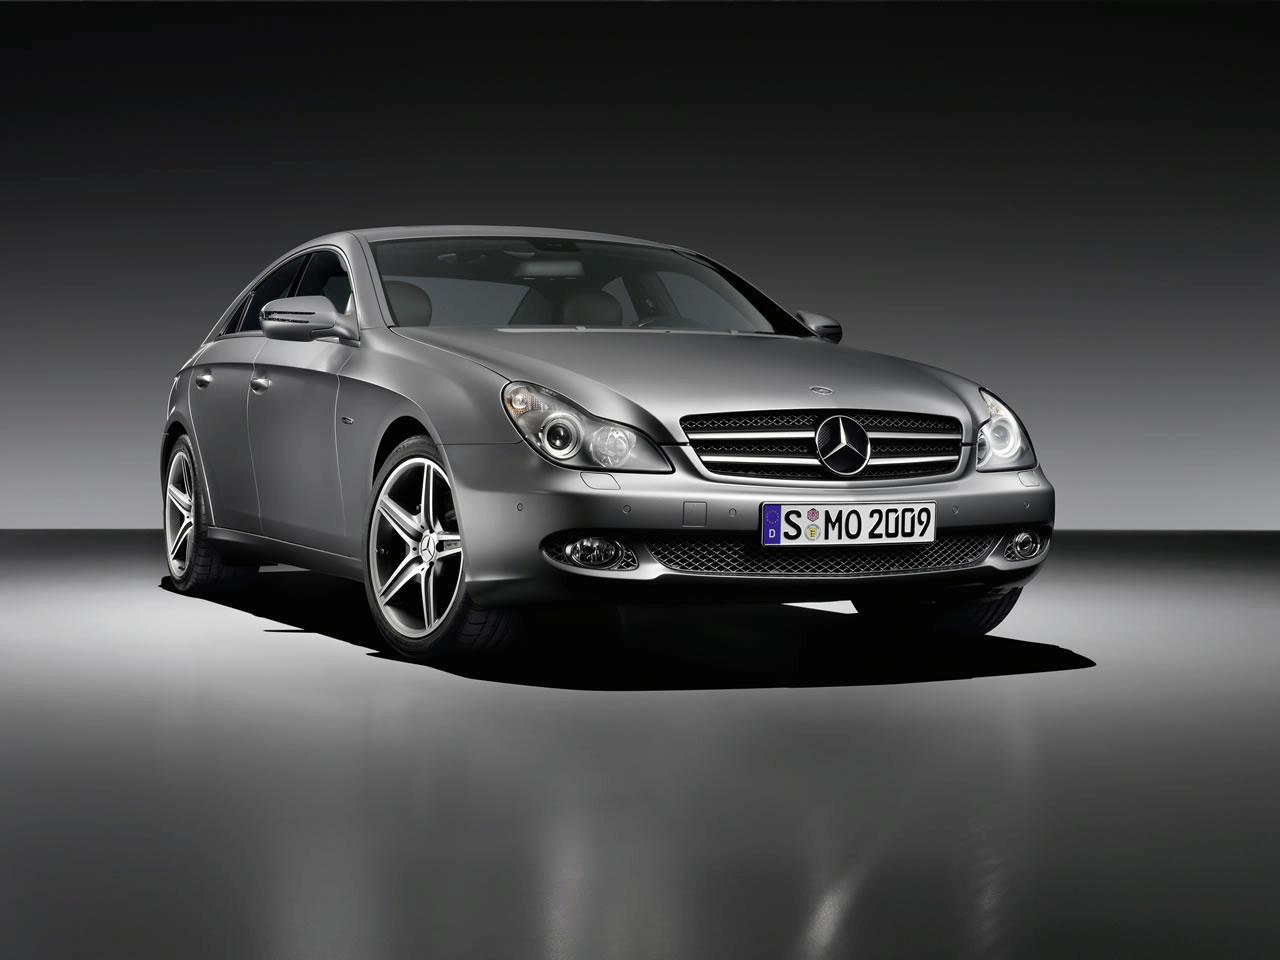 Mercedes Benz CLS-Class C219